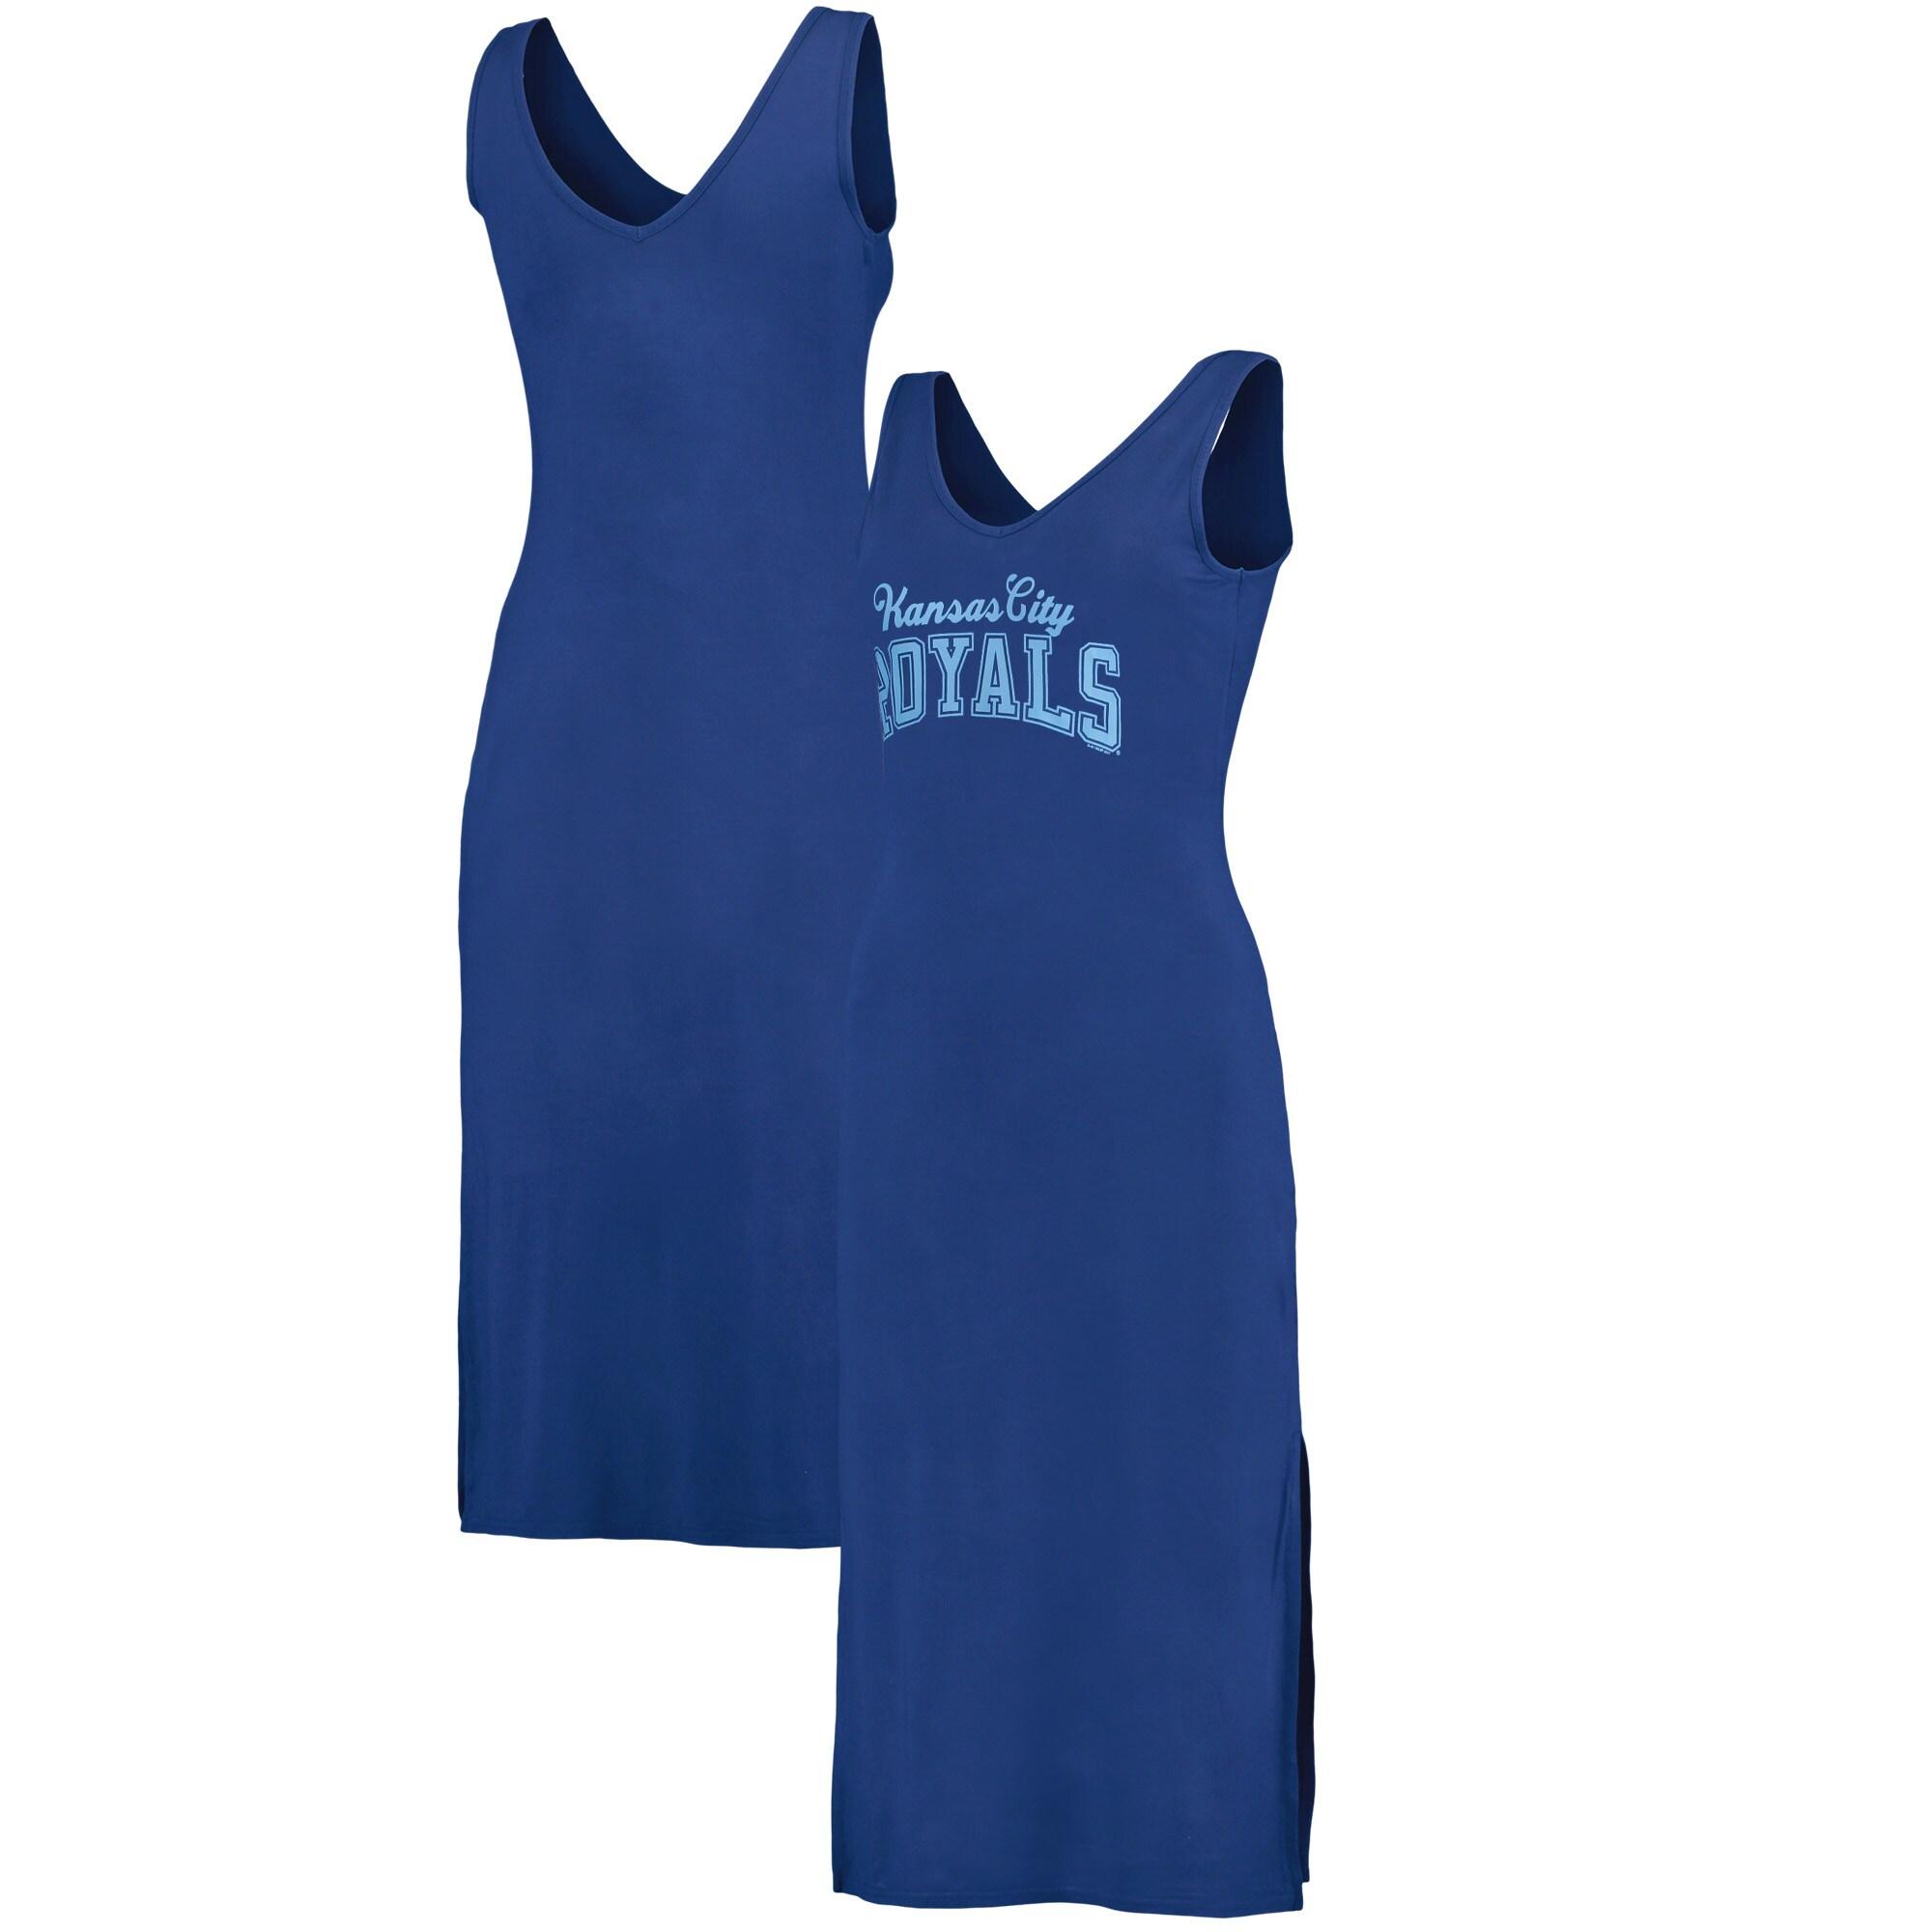 Kansas City Royals G-III 4Her by Carl Banks Women's Sideline Maxi Dress - Royal/Light Blue